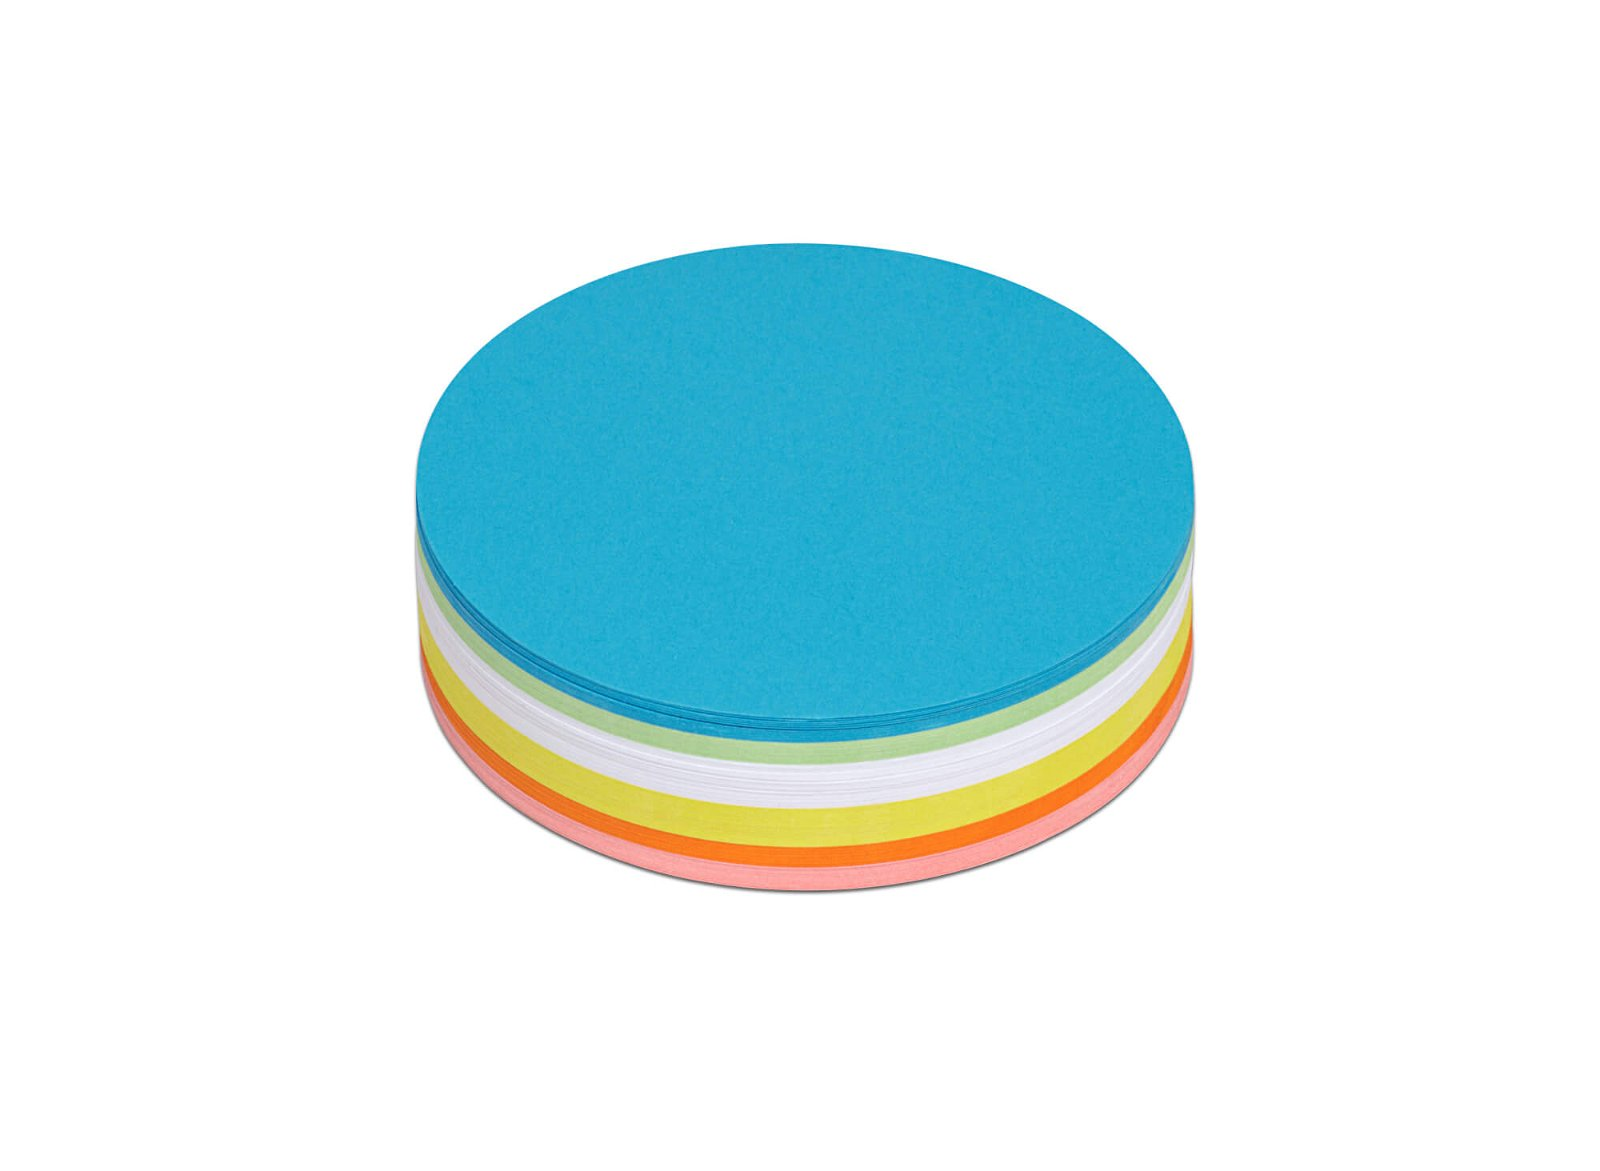 Moderationskarten rund, Ø 9,5 cm, 120 St./Pack, farbig sortiert